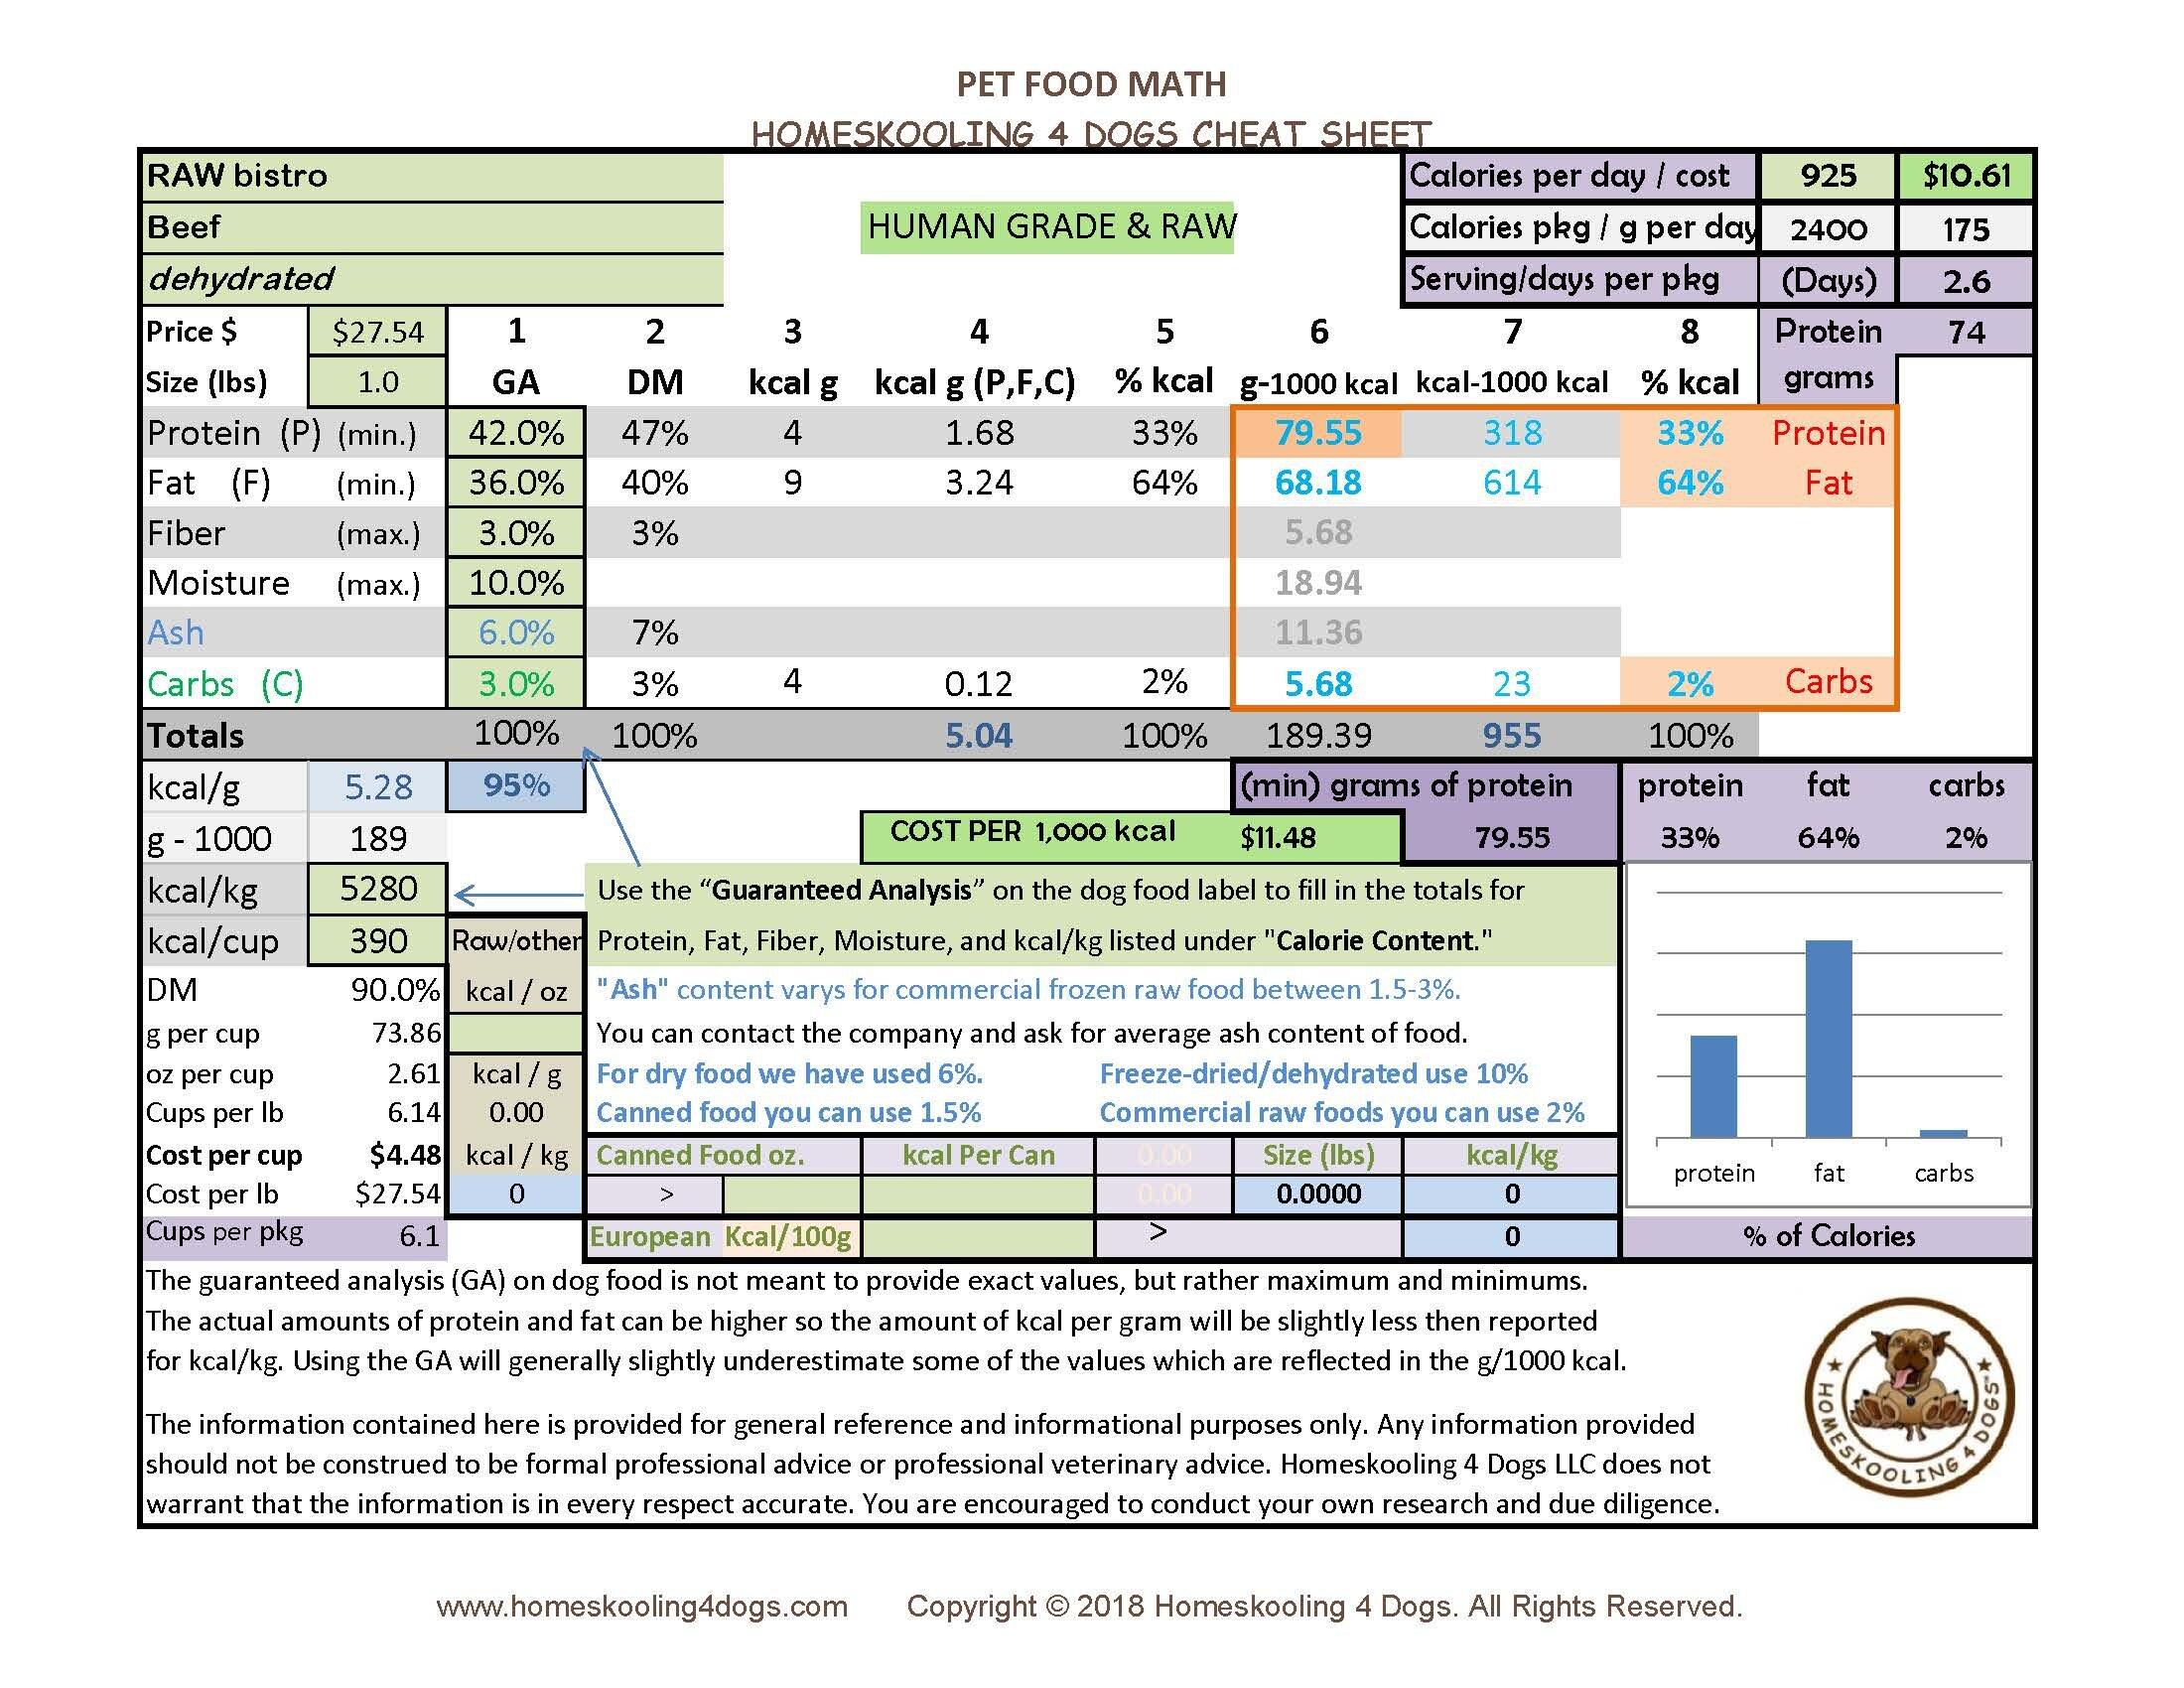 RAW bistro beef dehydrated Pet Food Math Cheat Sheet.jpg